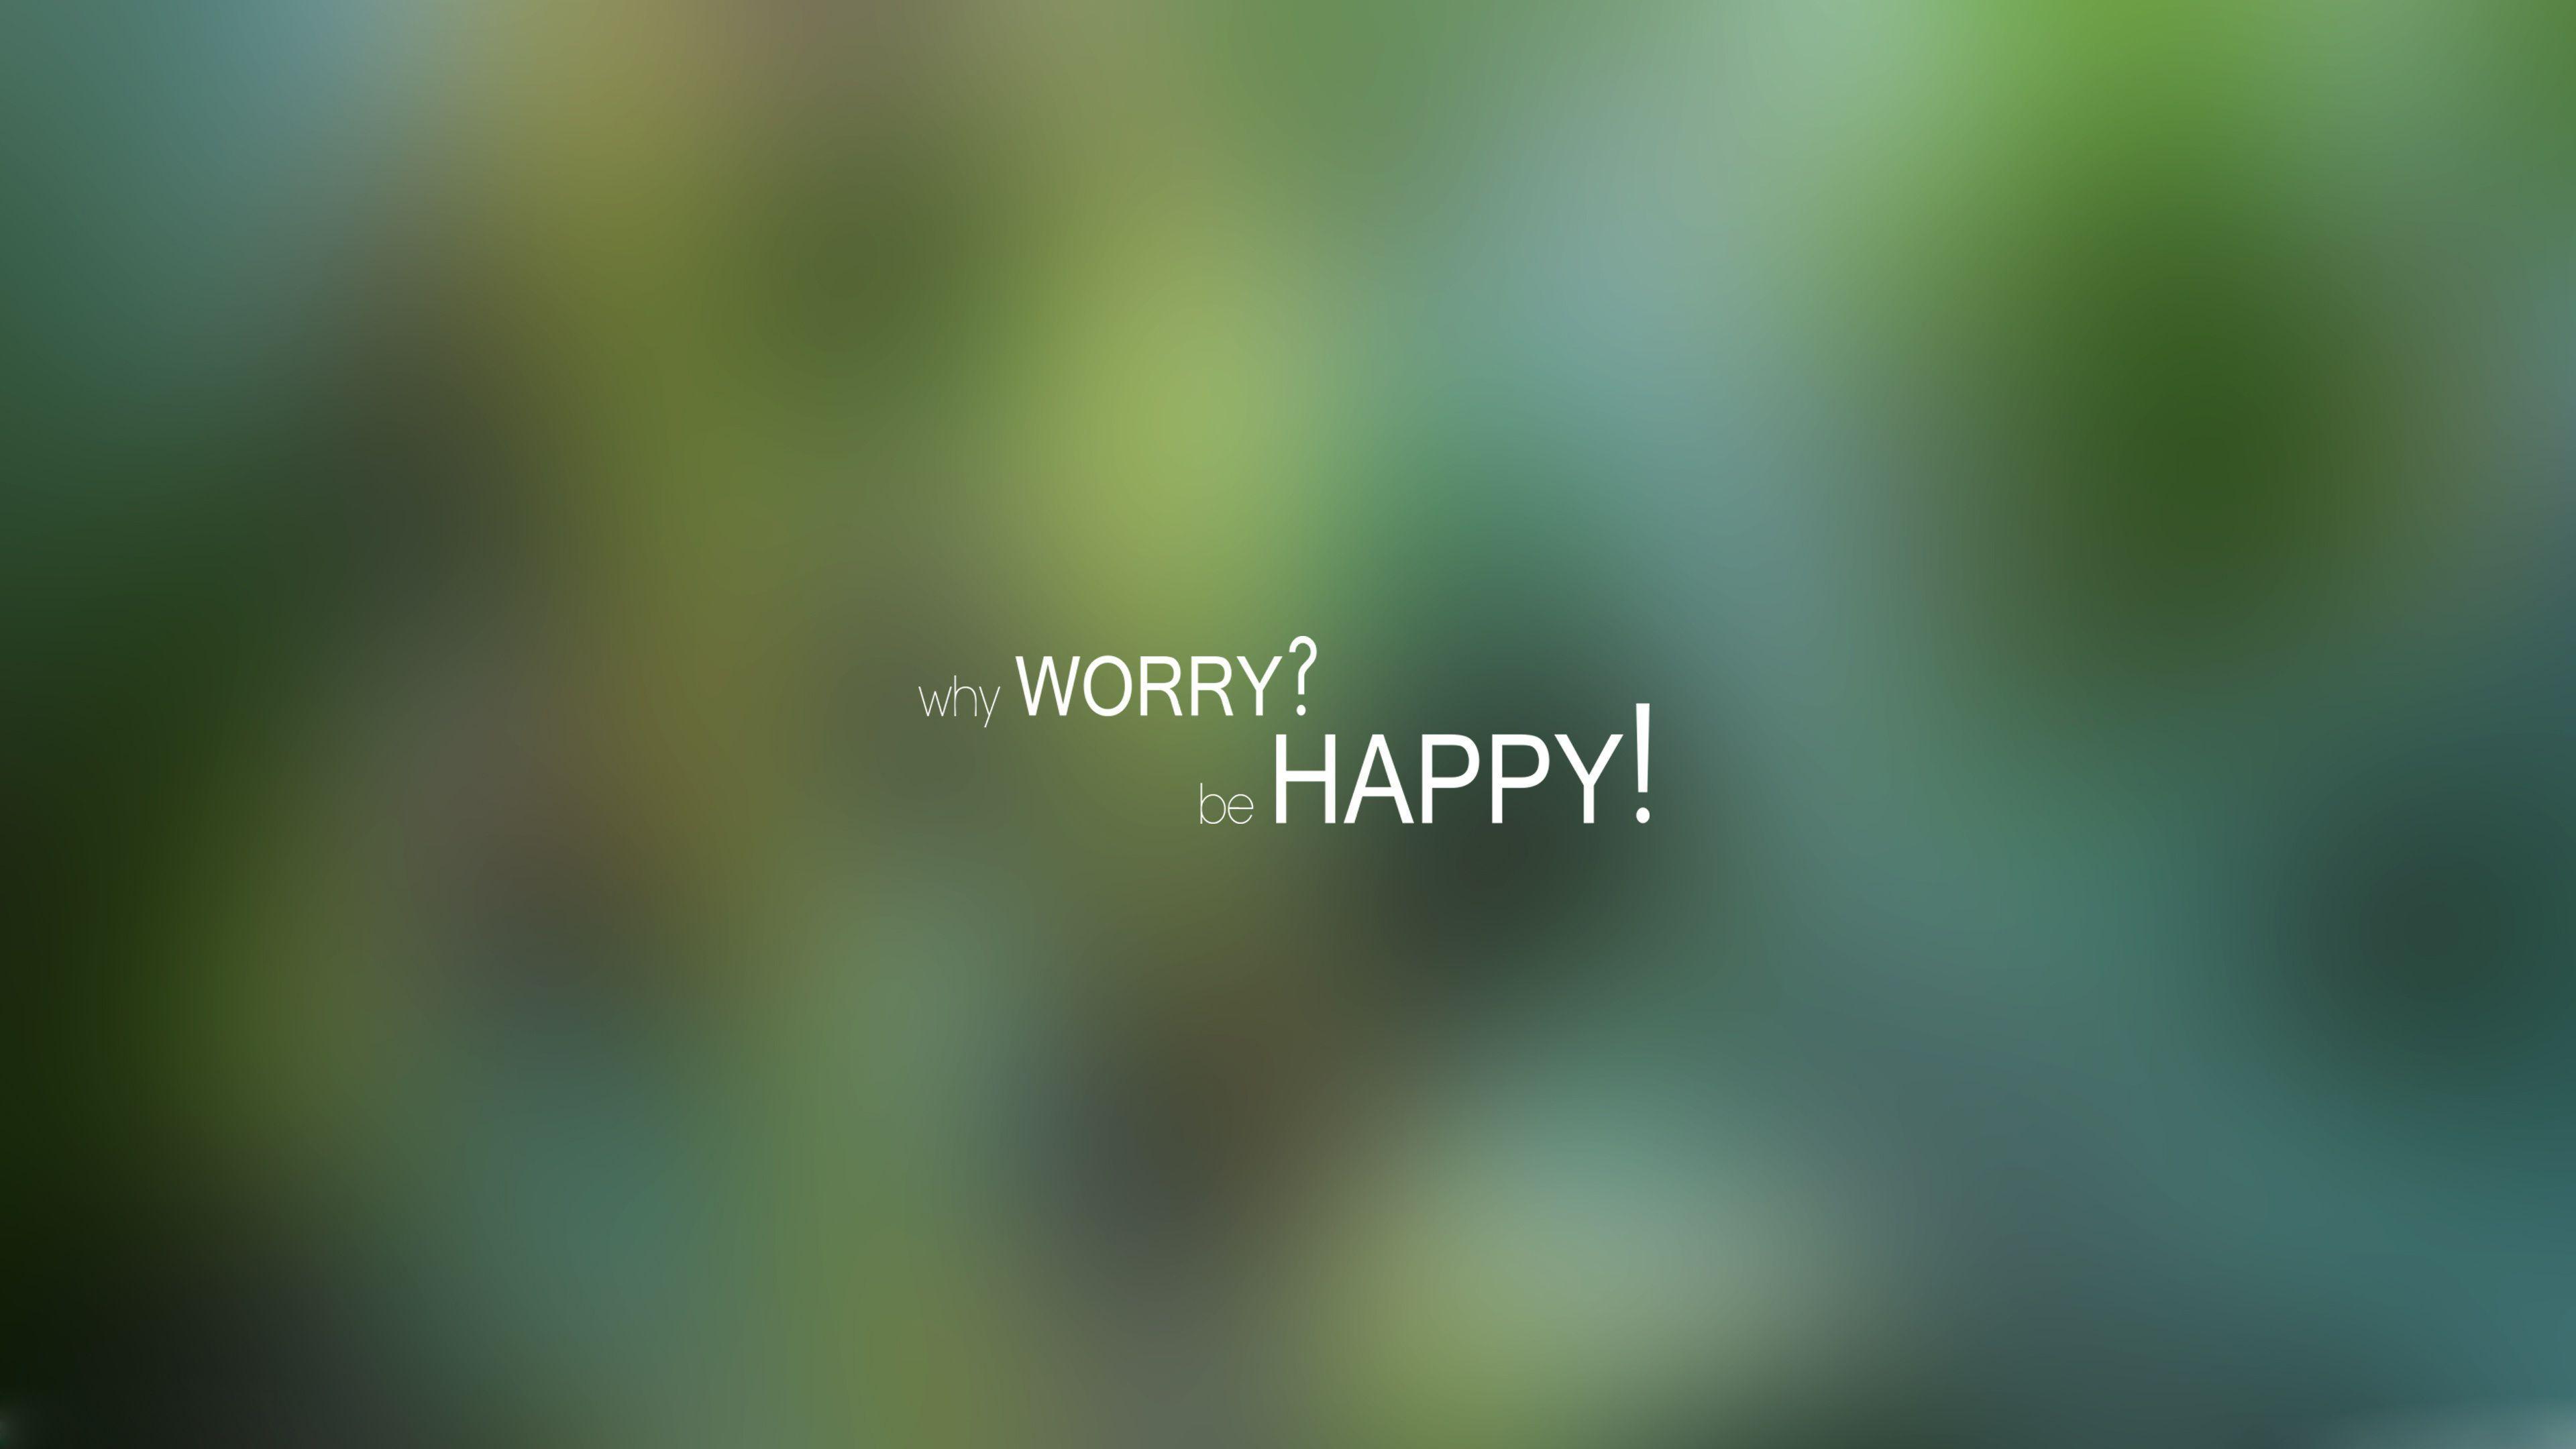 Happiness Quotes Desktop Wallpapers Top Free Happiness Quotes Desktop Backgrounds Wallpaperaccess